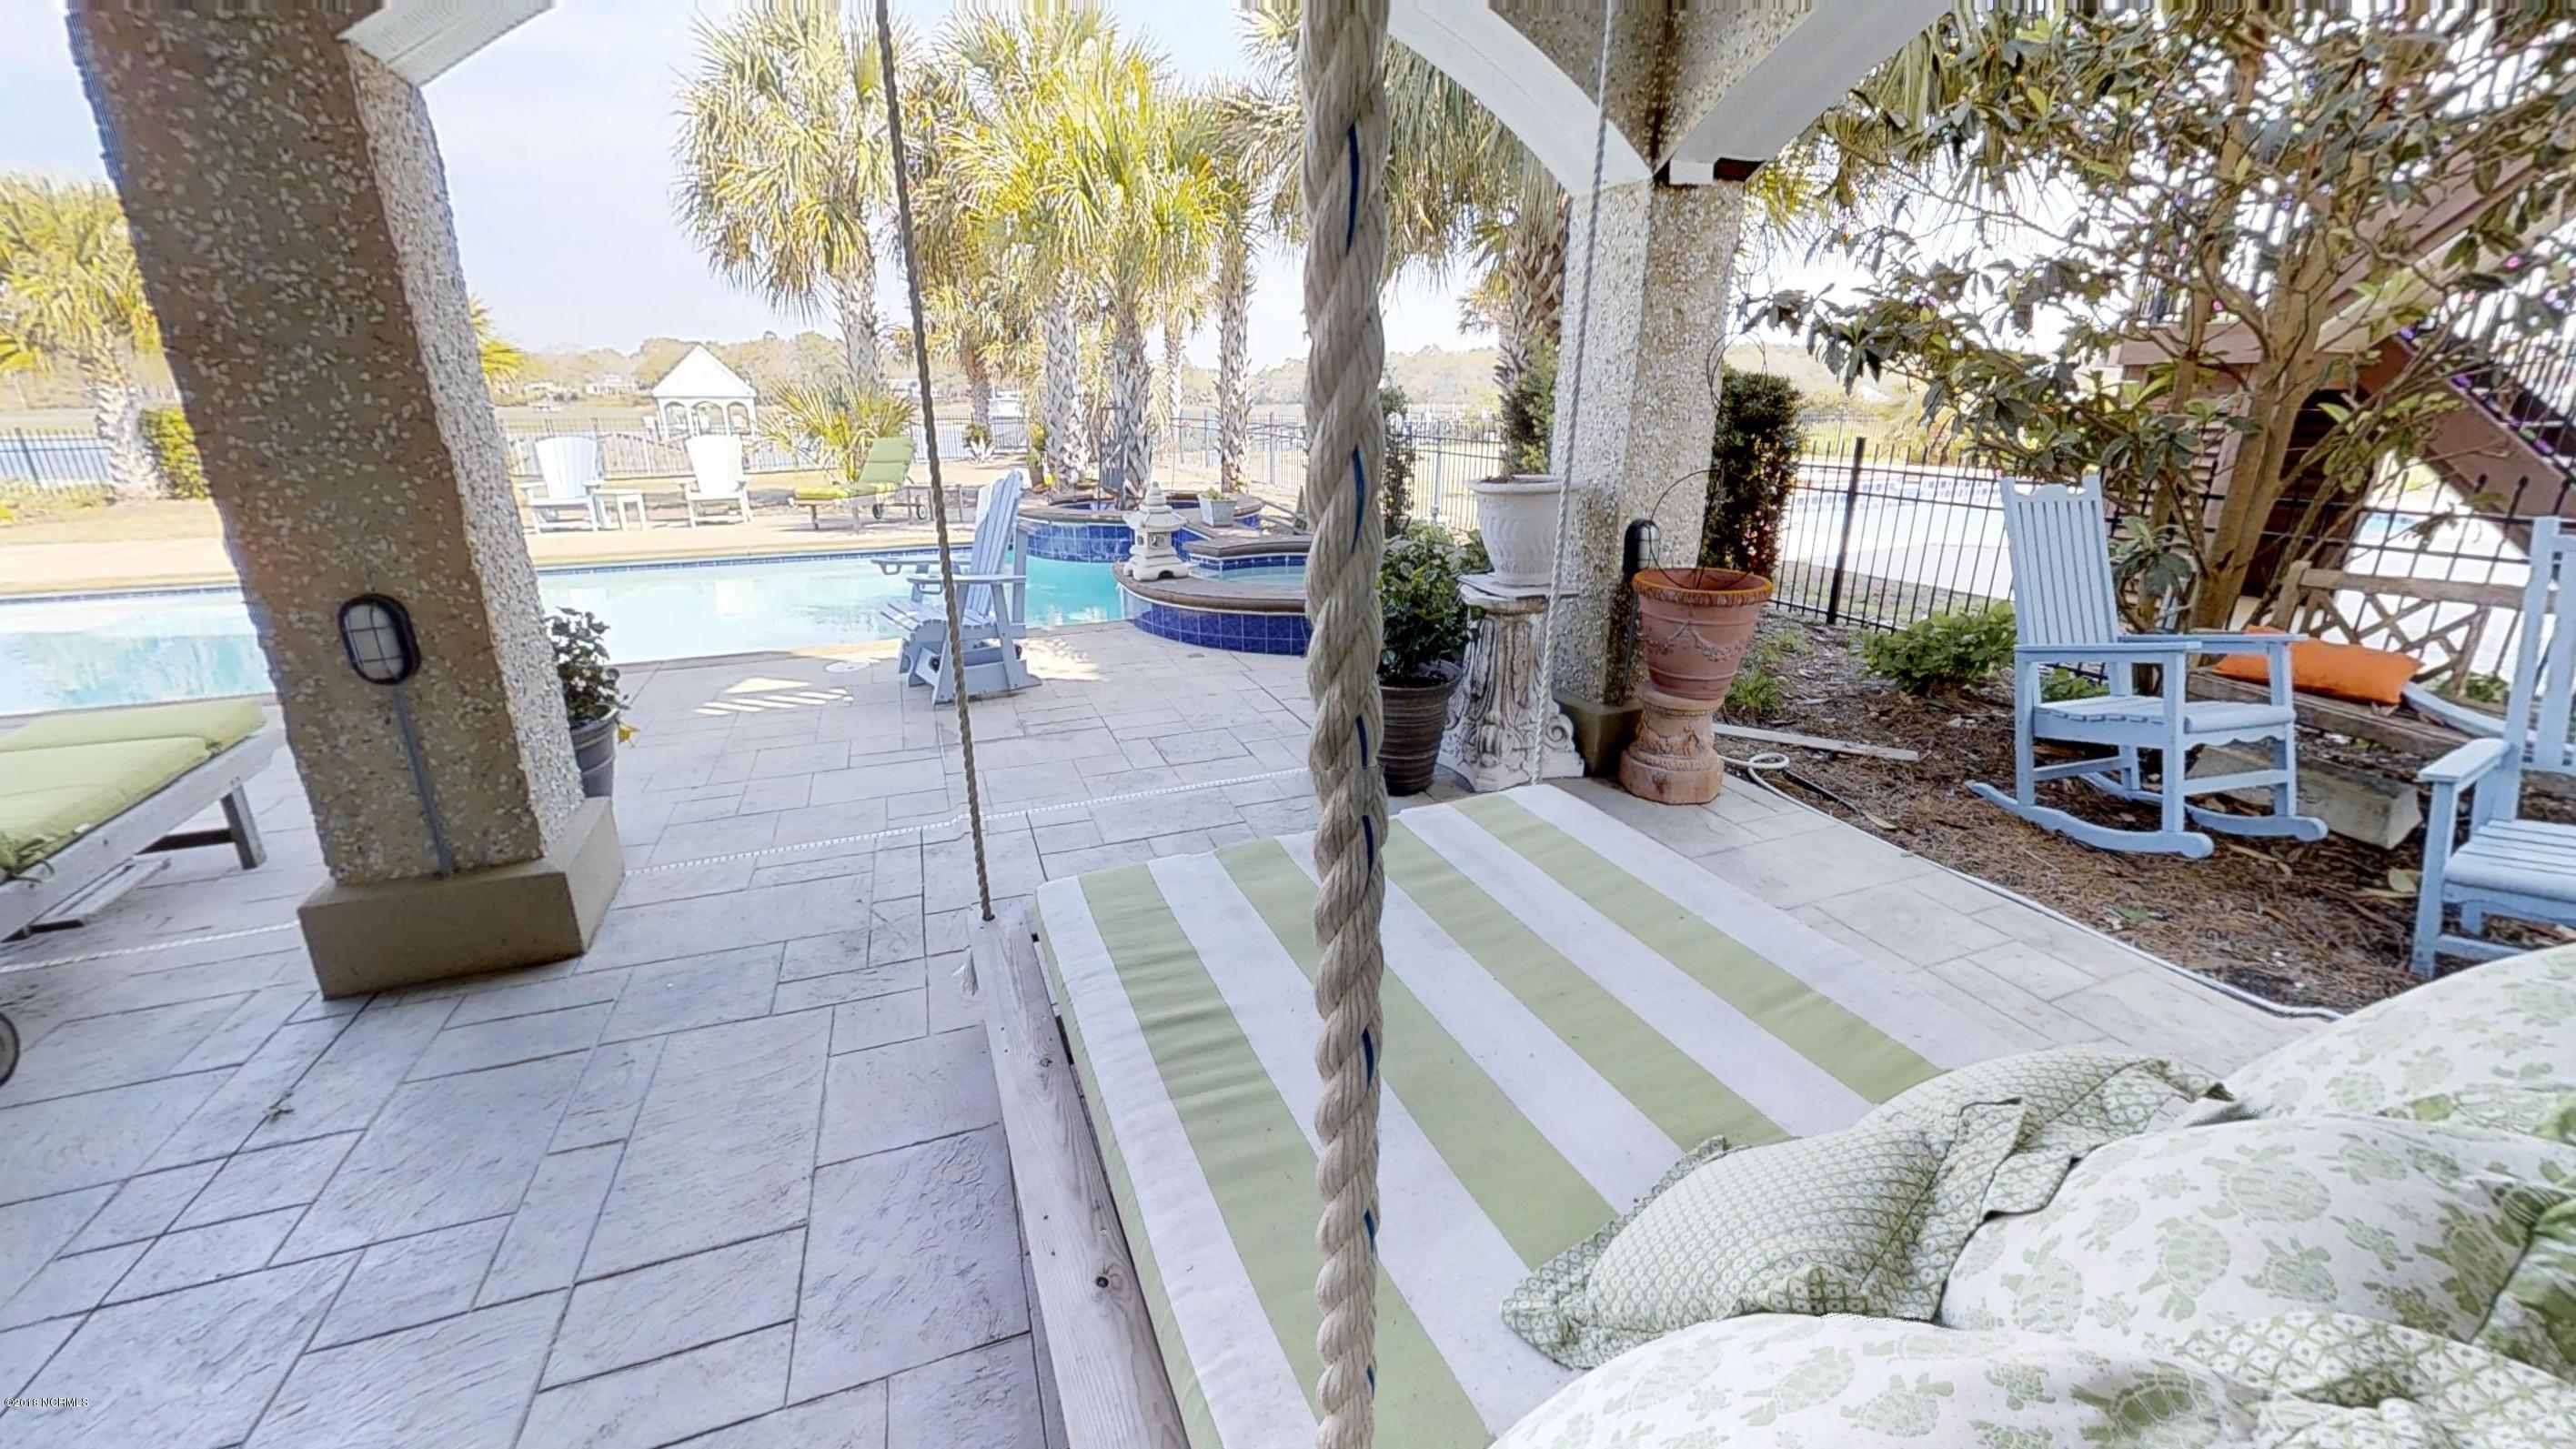 Ocean Isle Beach Real Estate - http://cdn.resize.sparkplatform.com/ncr/1024x768/true/20180414120407838697000000-o.jpg